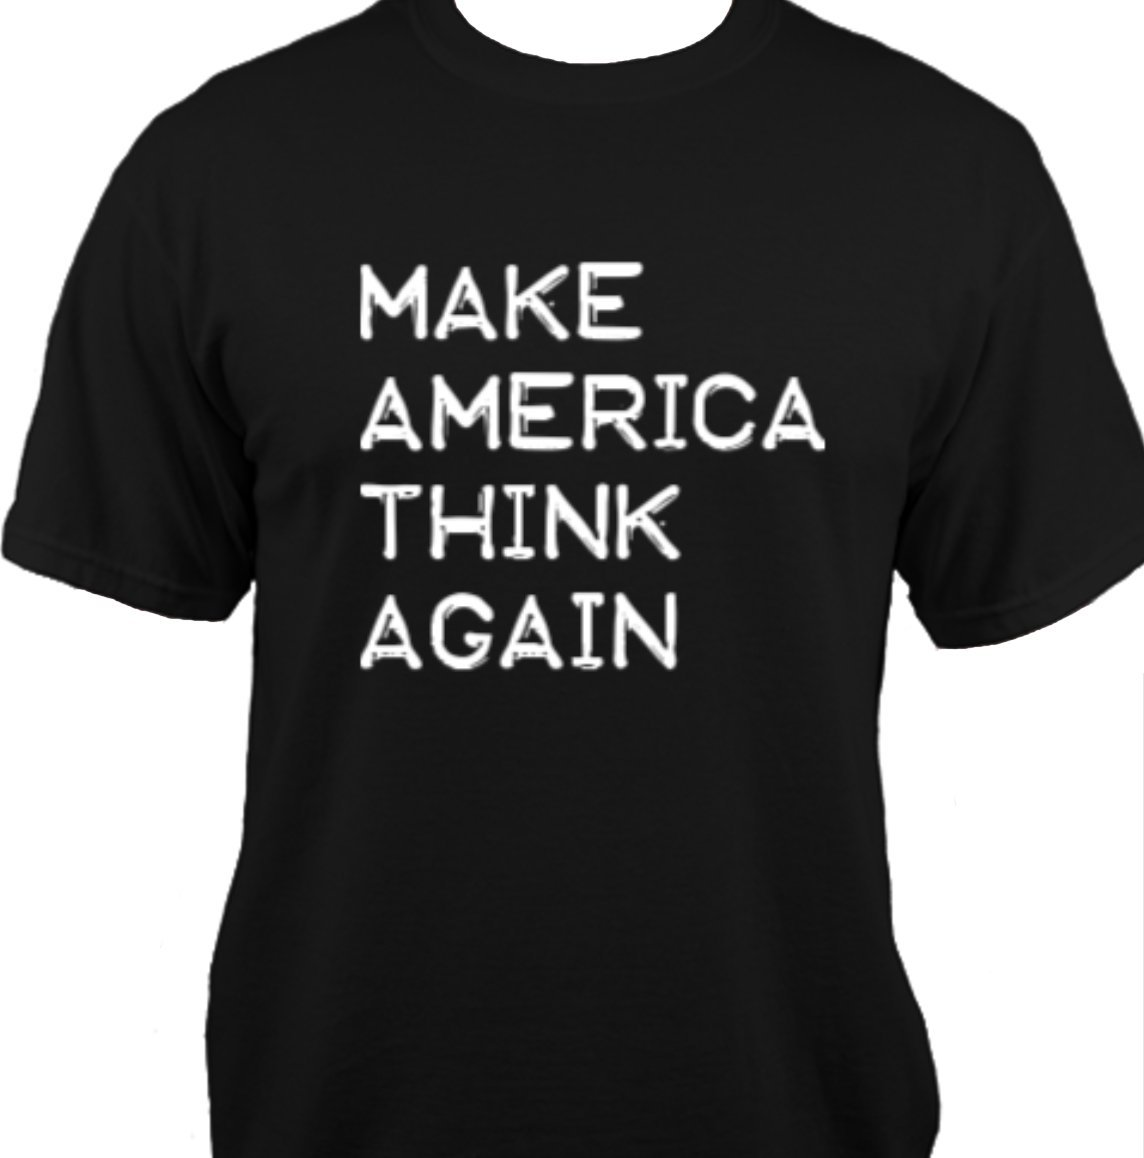 Make America Think Again - Anti-Trump Pro-Science Shirt (Large)